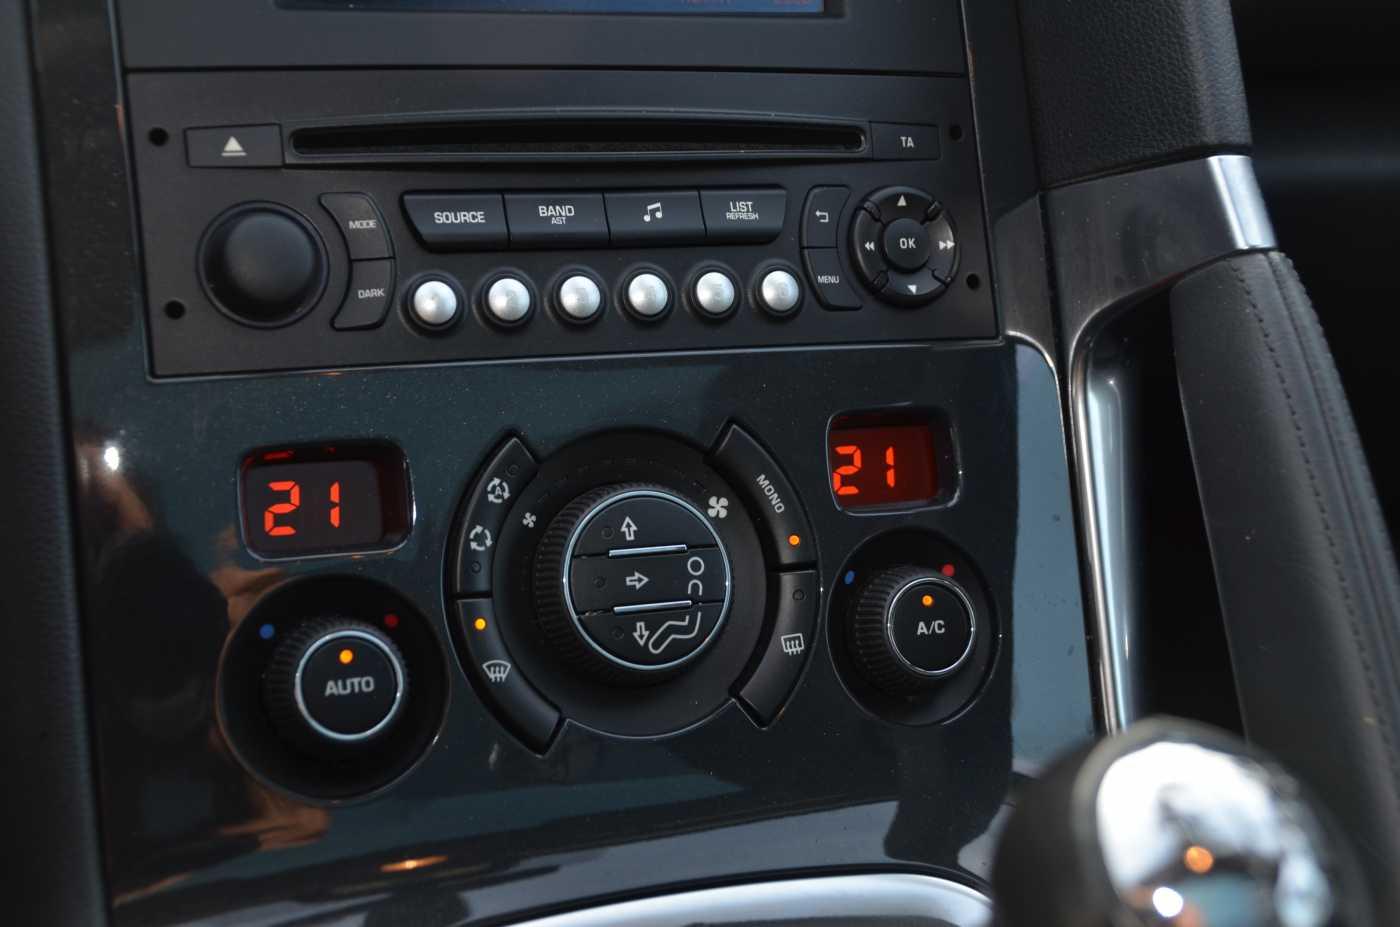 Peugeot 3008 2.0 HDi Allure 150CV 10/13